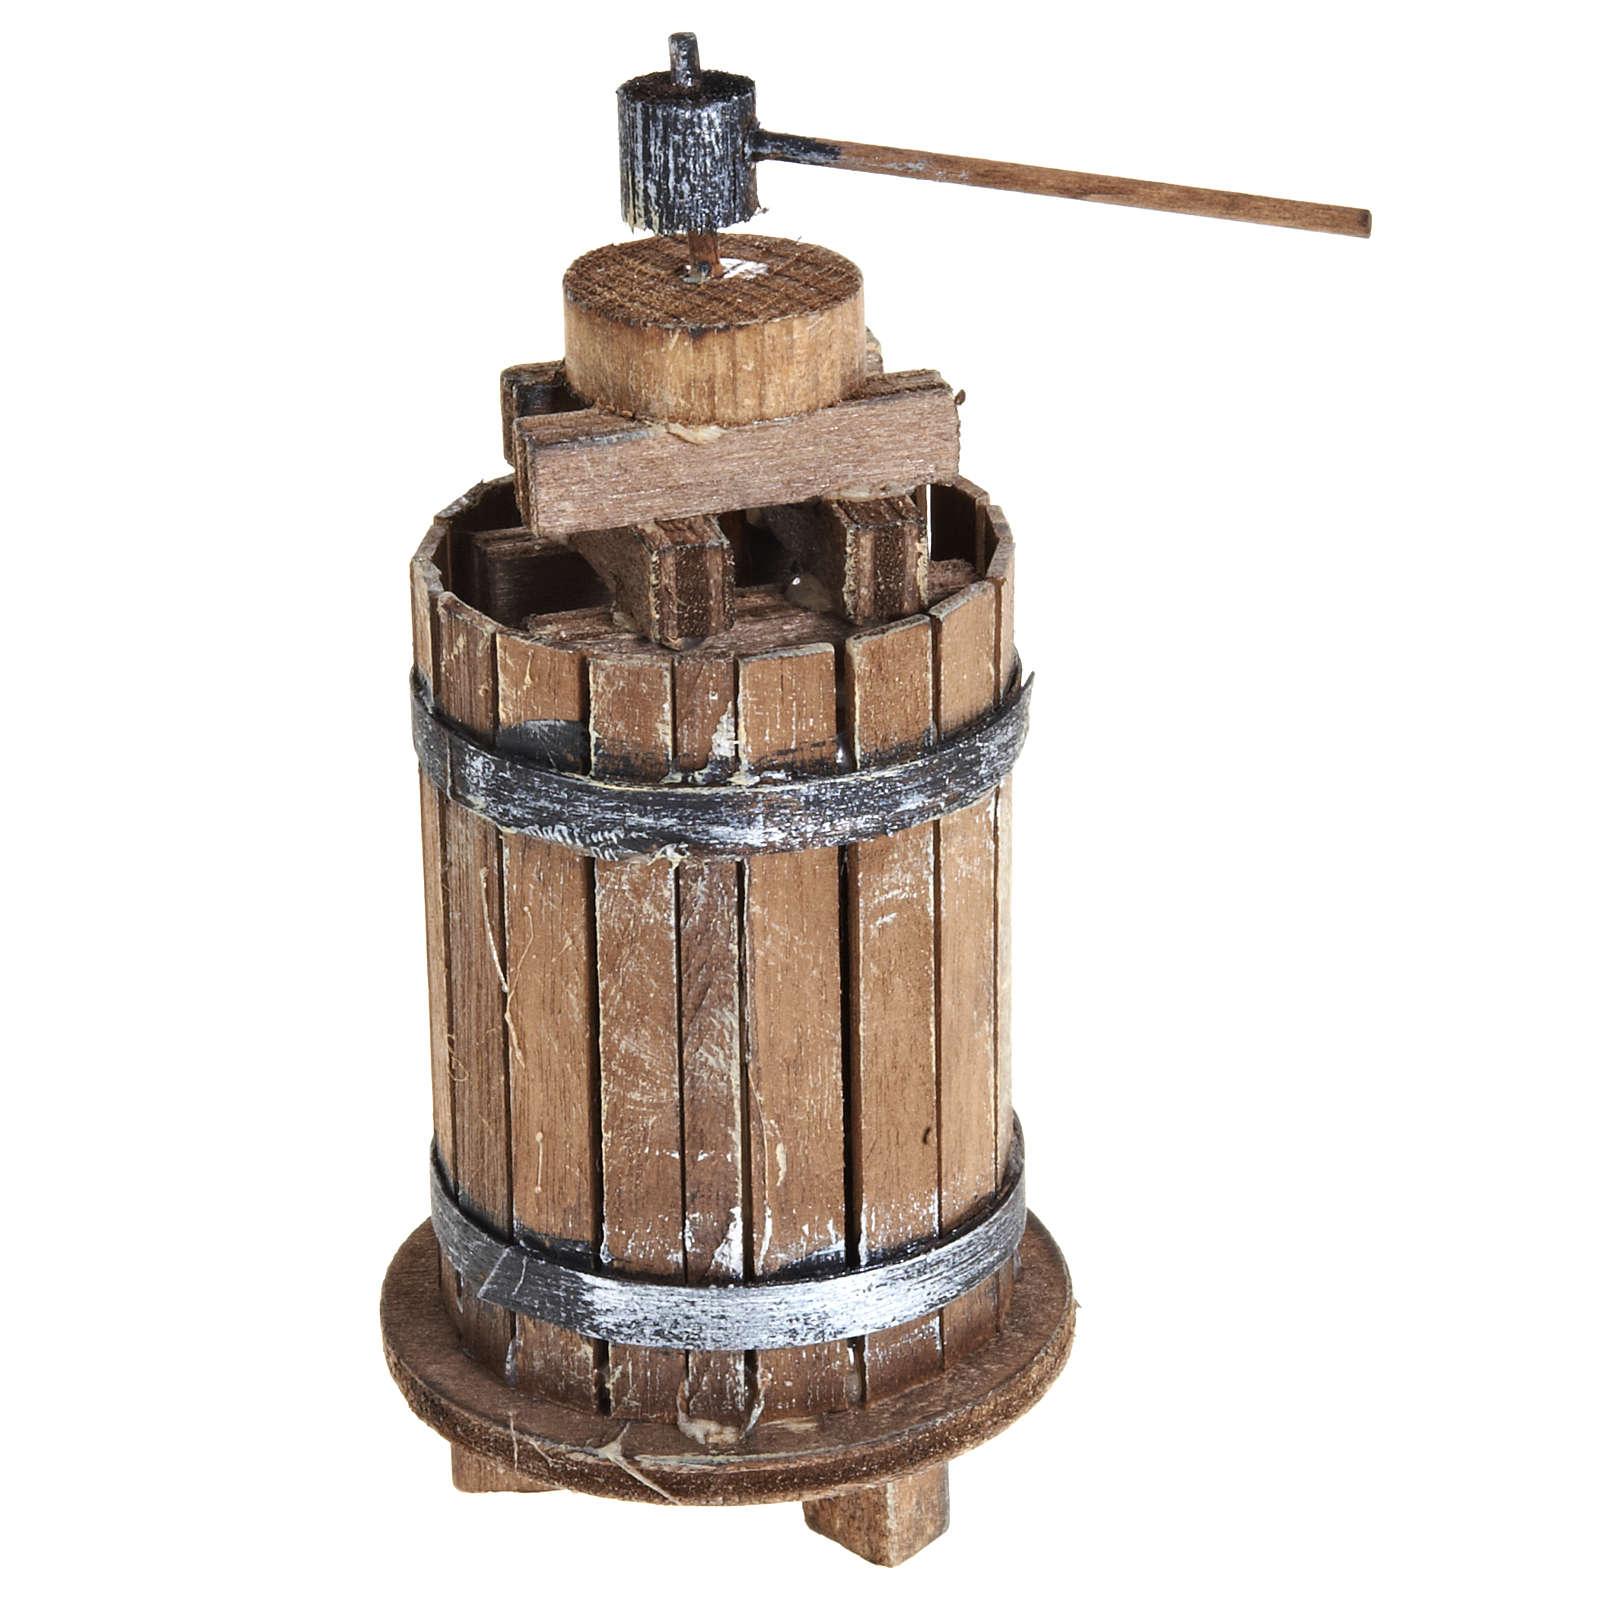 wooden press 11cm 4